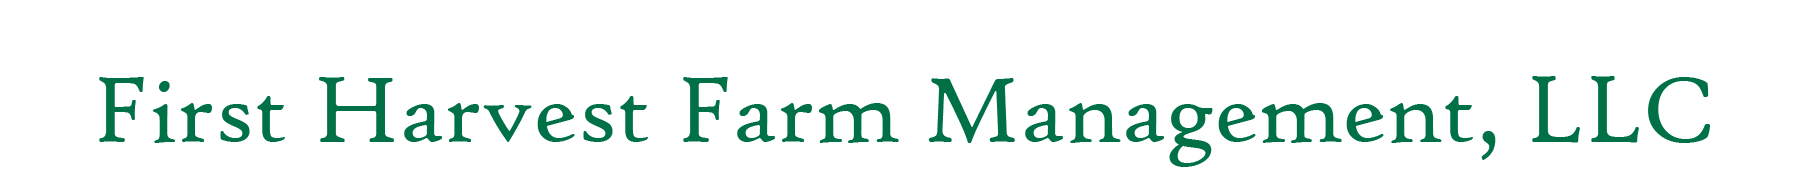 First Harvest Farm Management